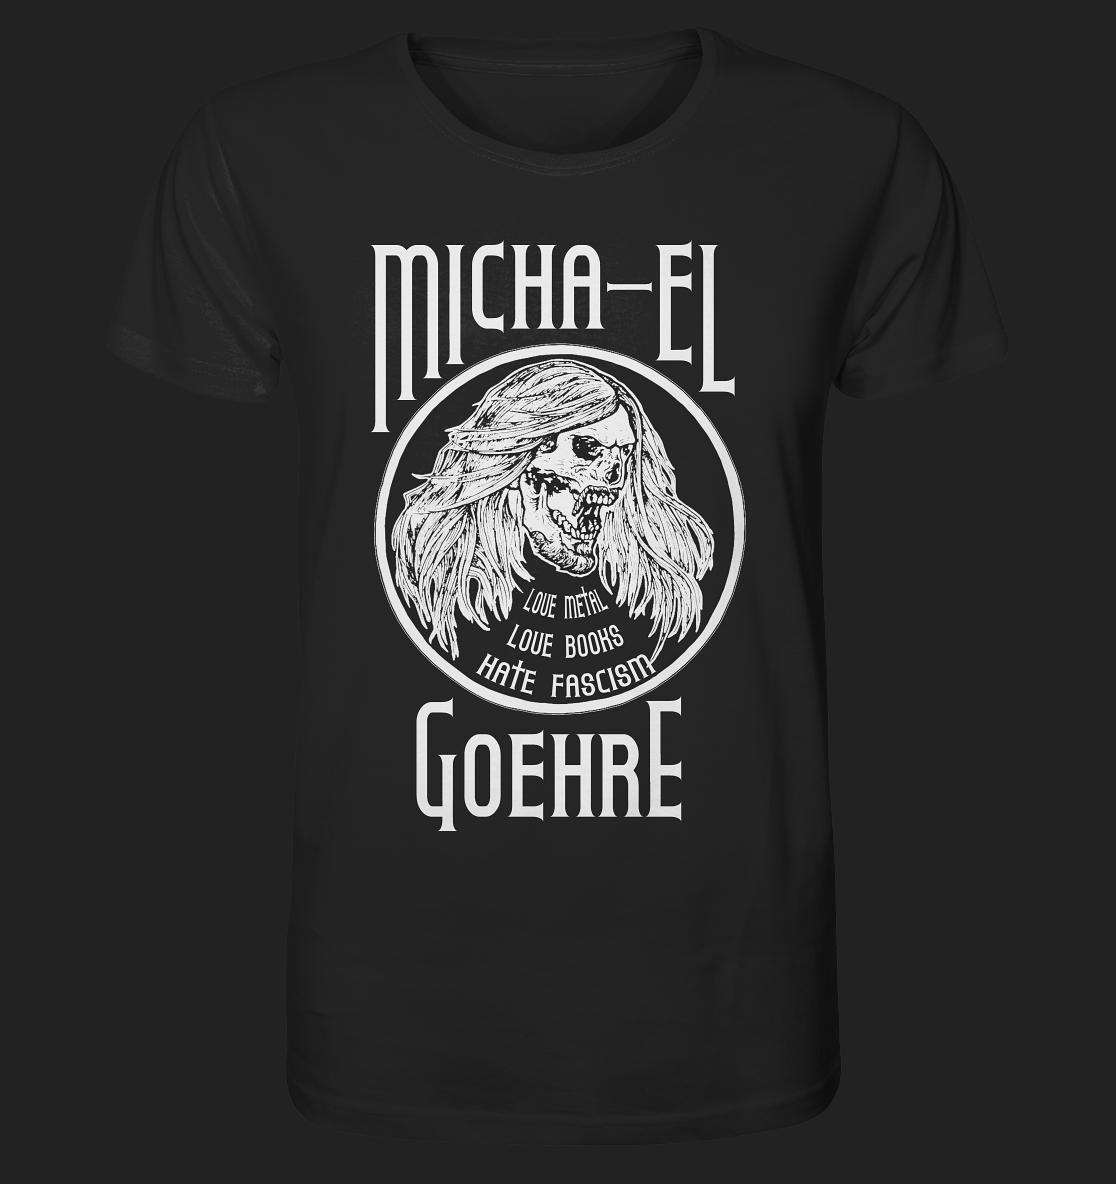 Fan-T-Shirt Micha-El Goehre - Schädel mit Schrift